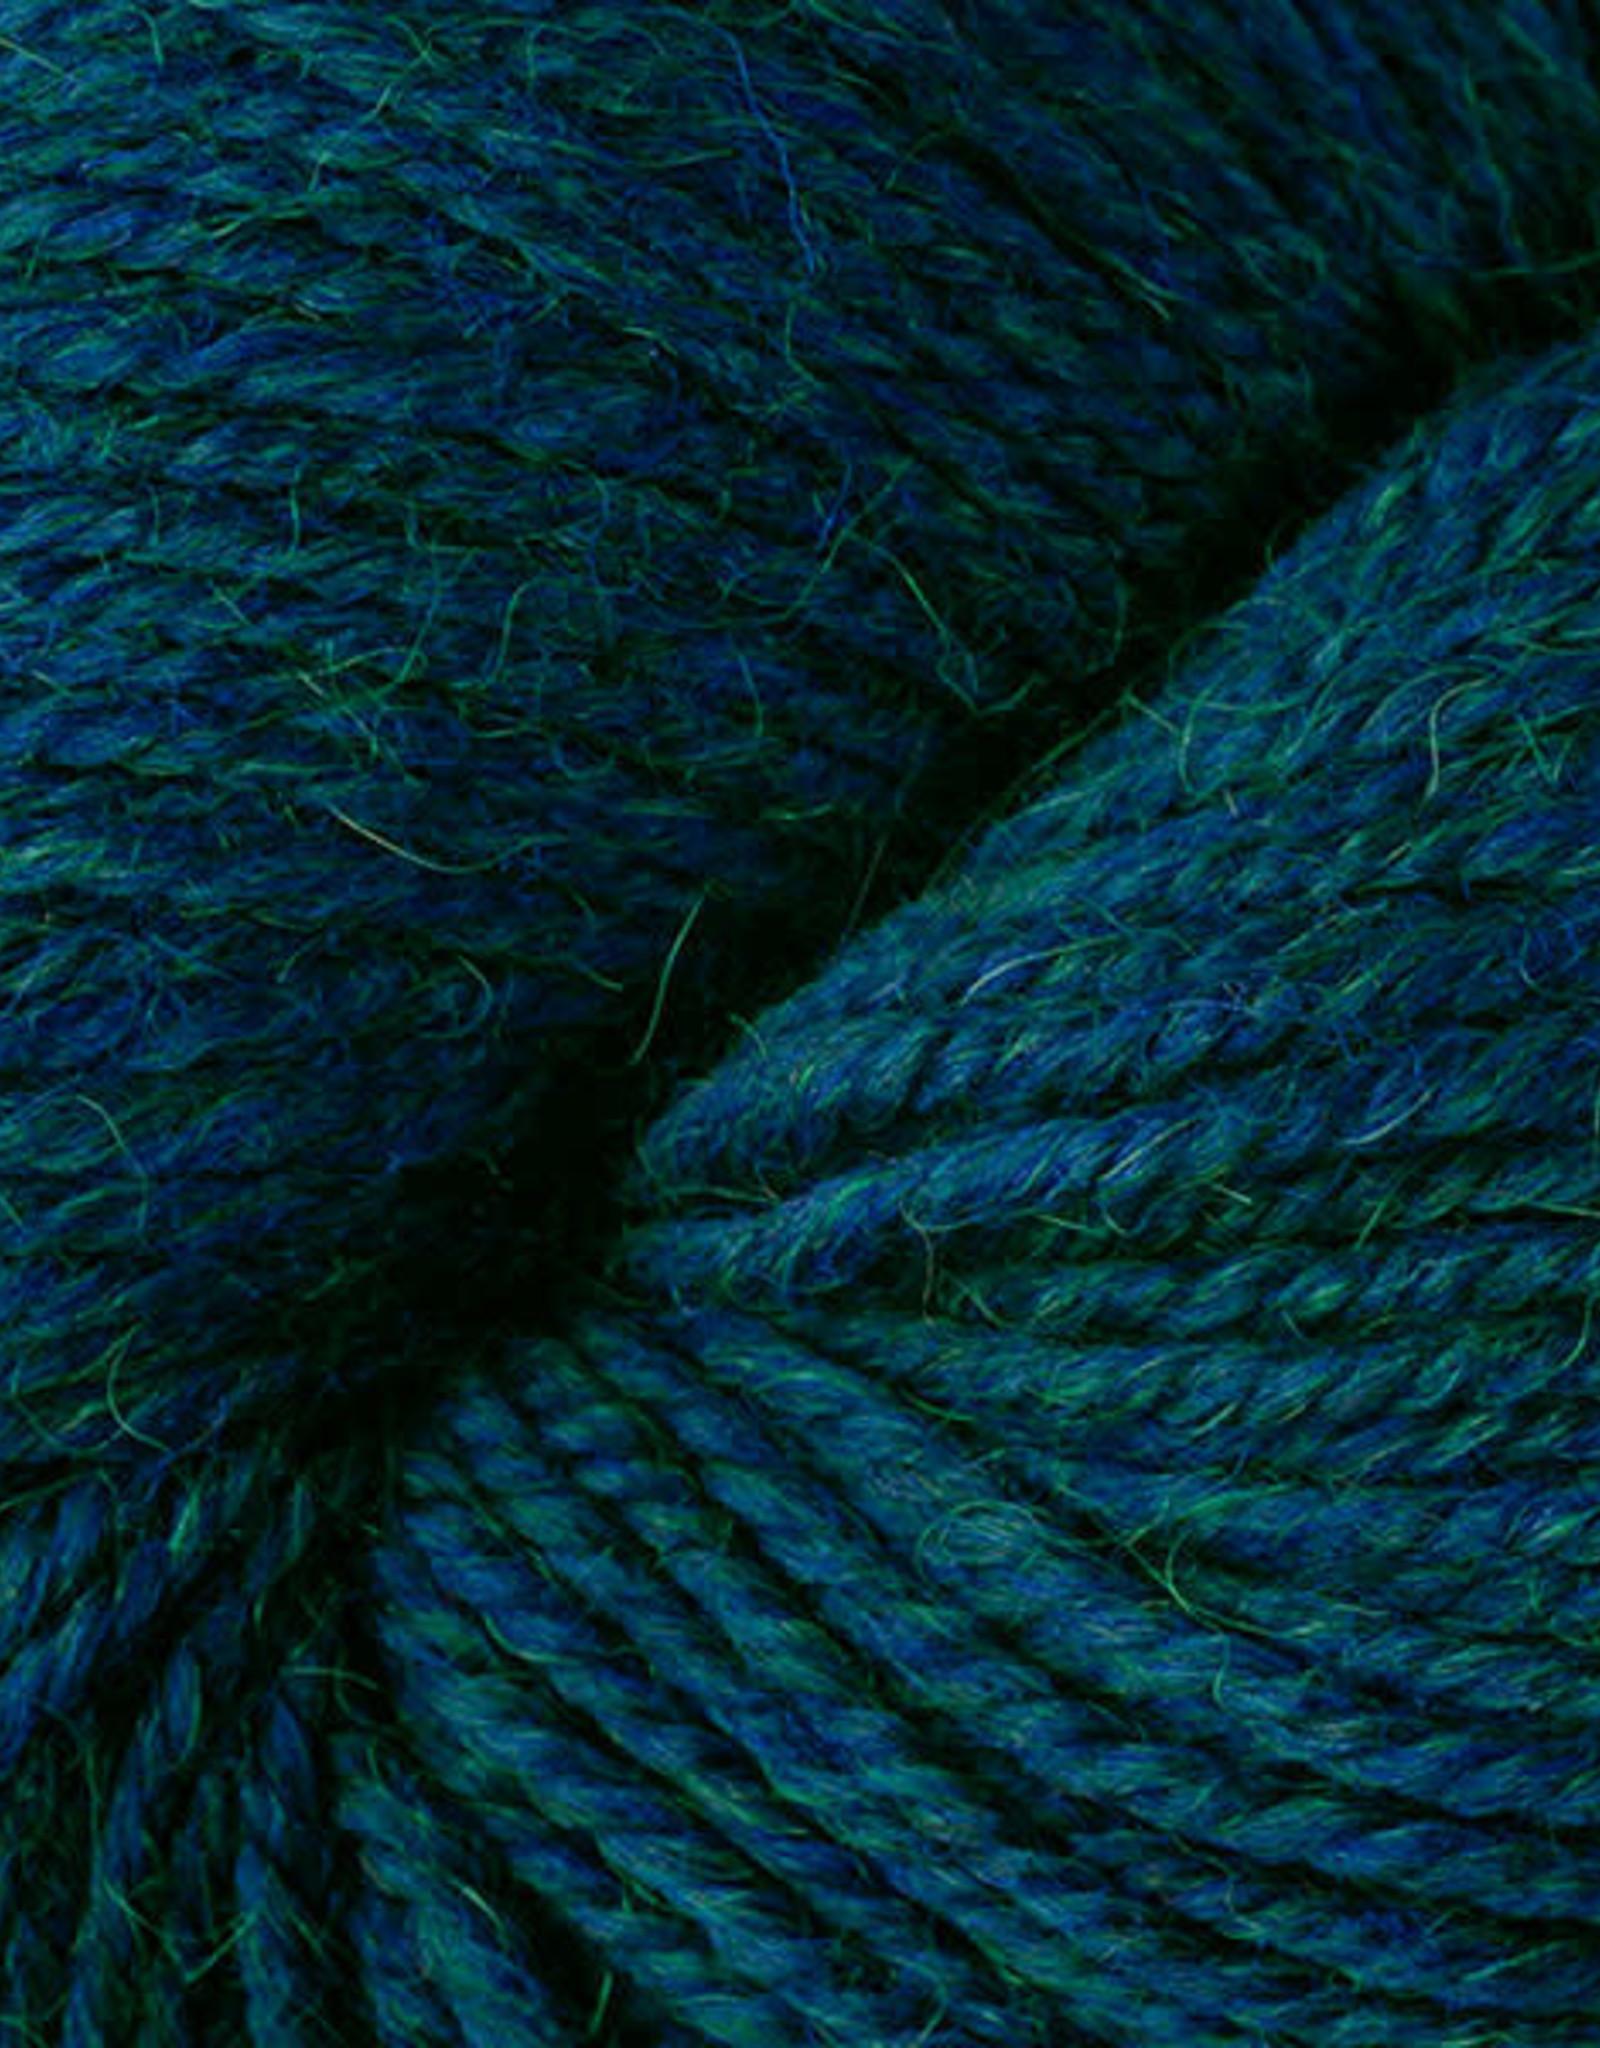 Berroco Ultra Alpaca Worst 6285 oceanic mix